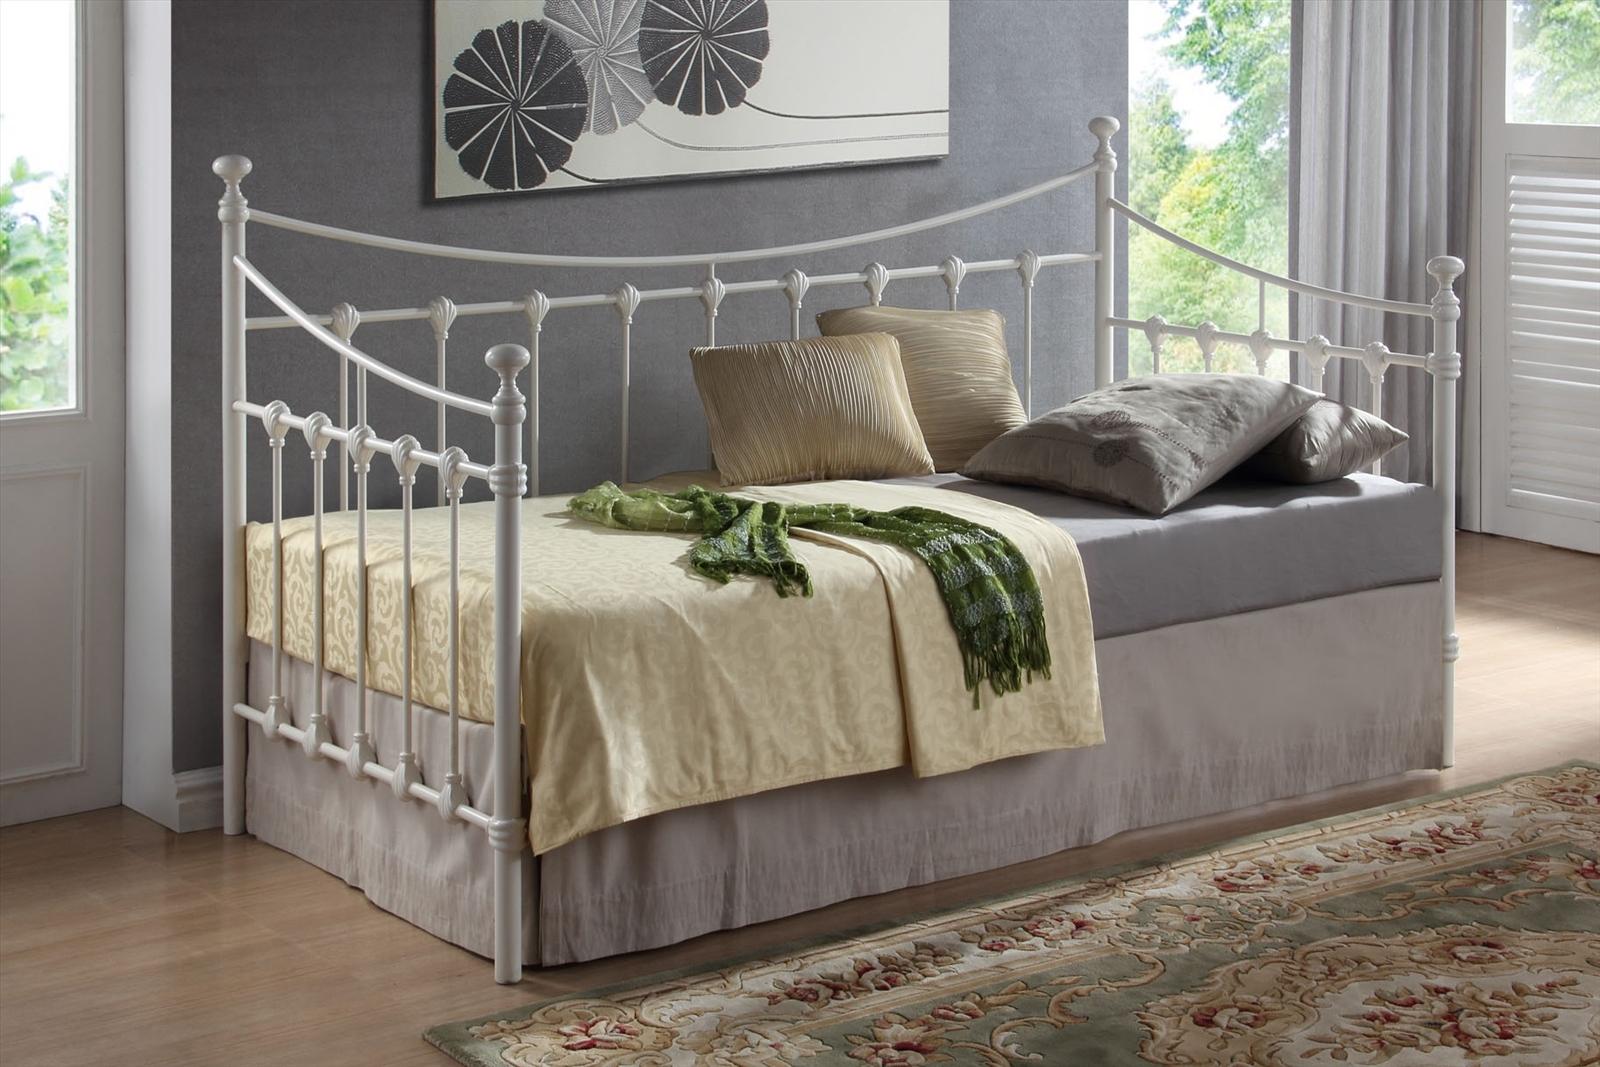 ivory bedroom furniture tesco modroxcom - Tesco Bedroom Furniture